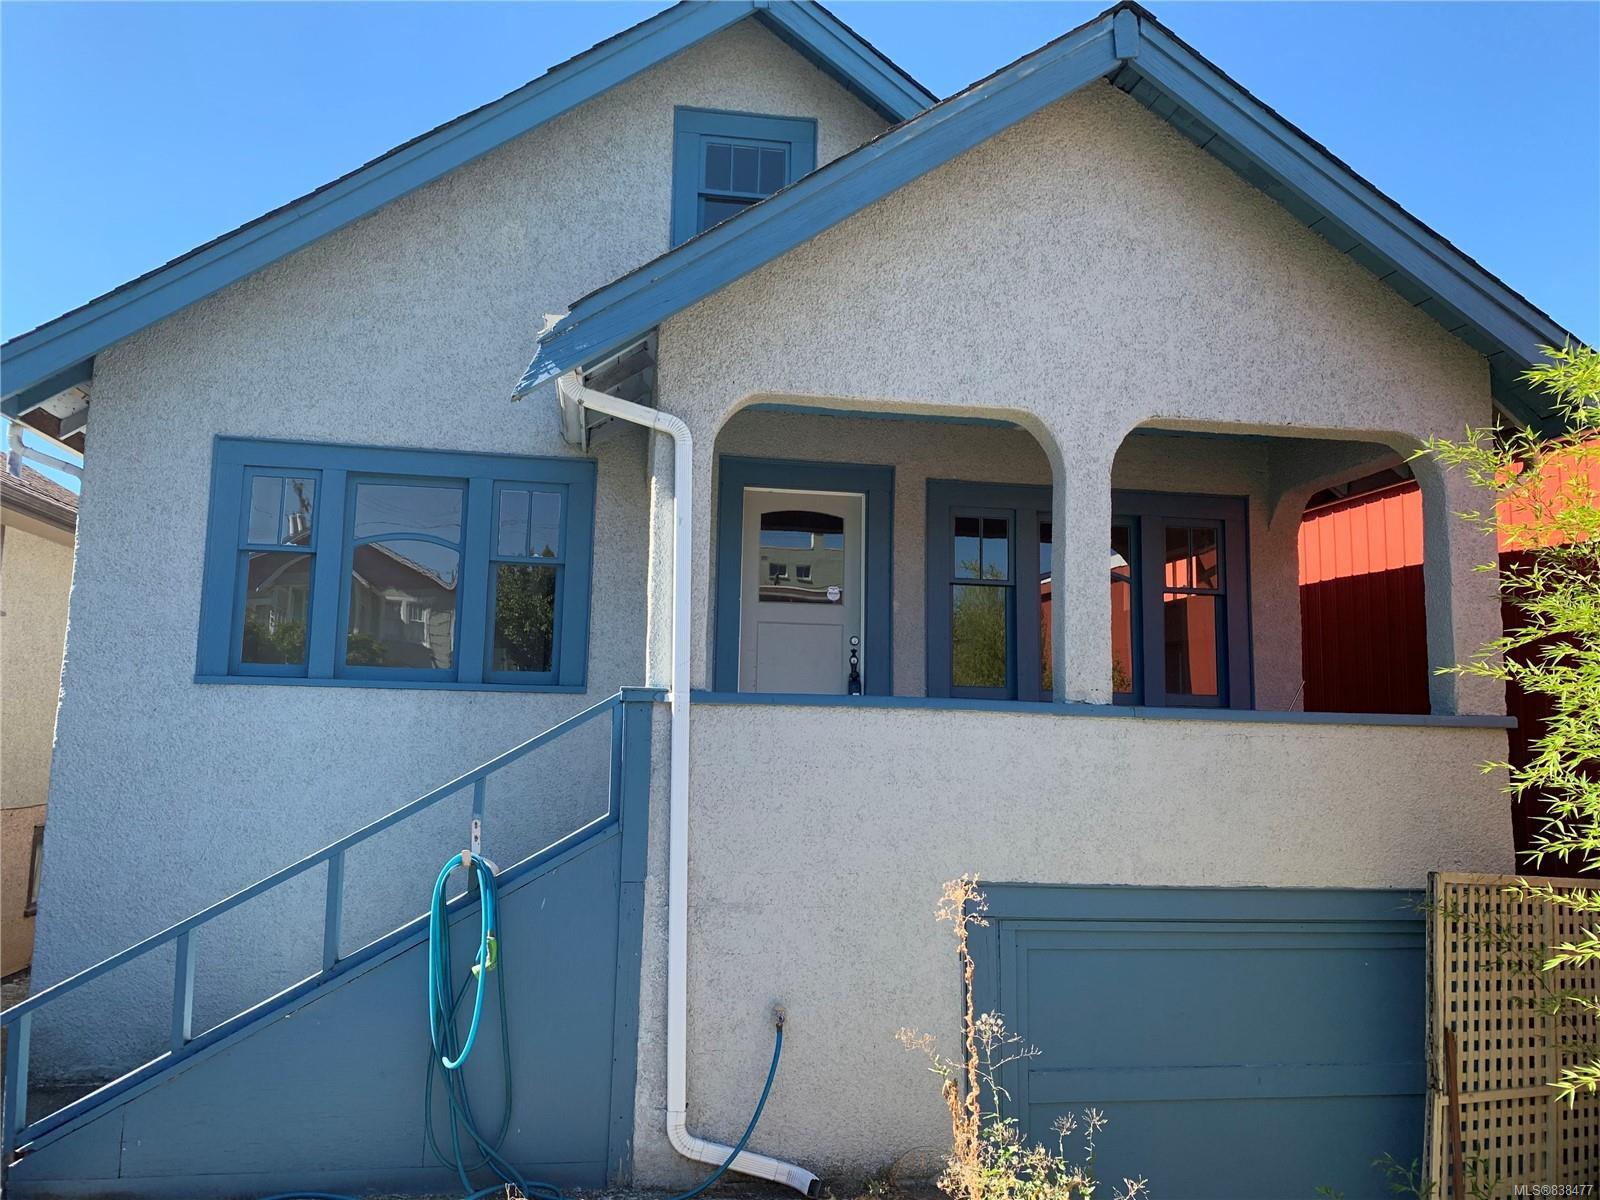 Main Photo: 2988 2nd Ave in PORT ALBERNI: PA Port Alberni House for sale (Port Alberni)  : MLS®# 838477